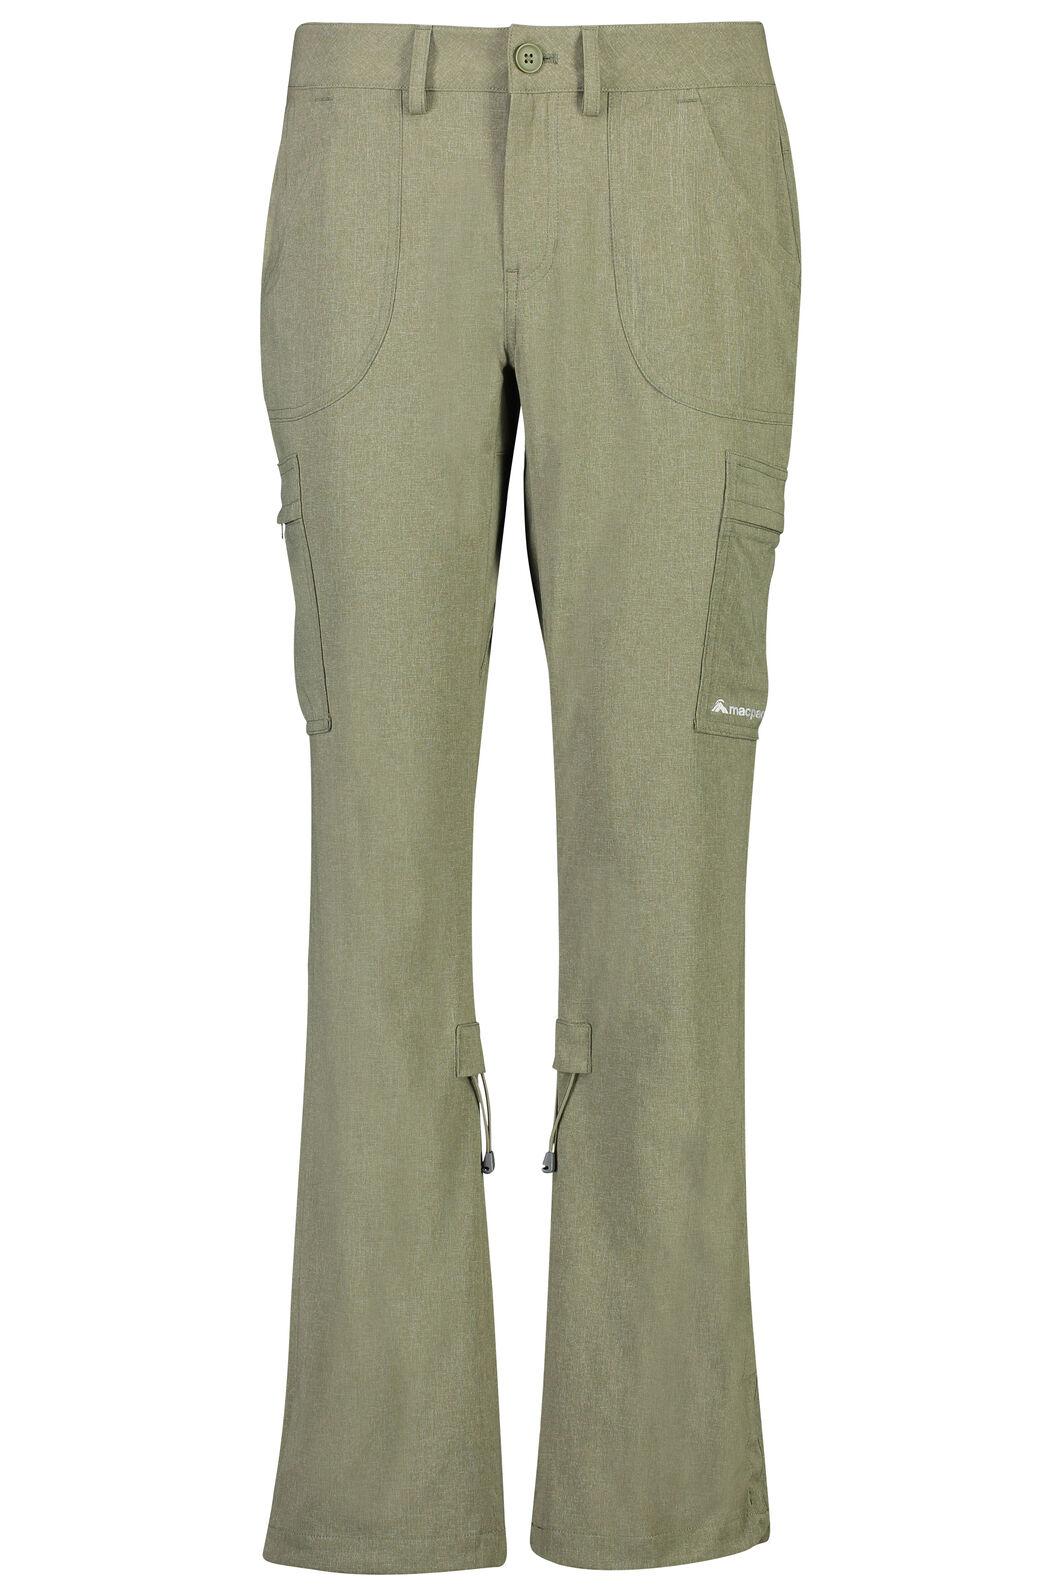 Macpac It's a Cinch Pants - Women's, Grape Leaf, hi-res